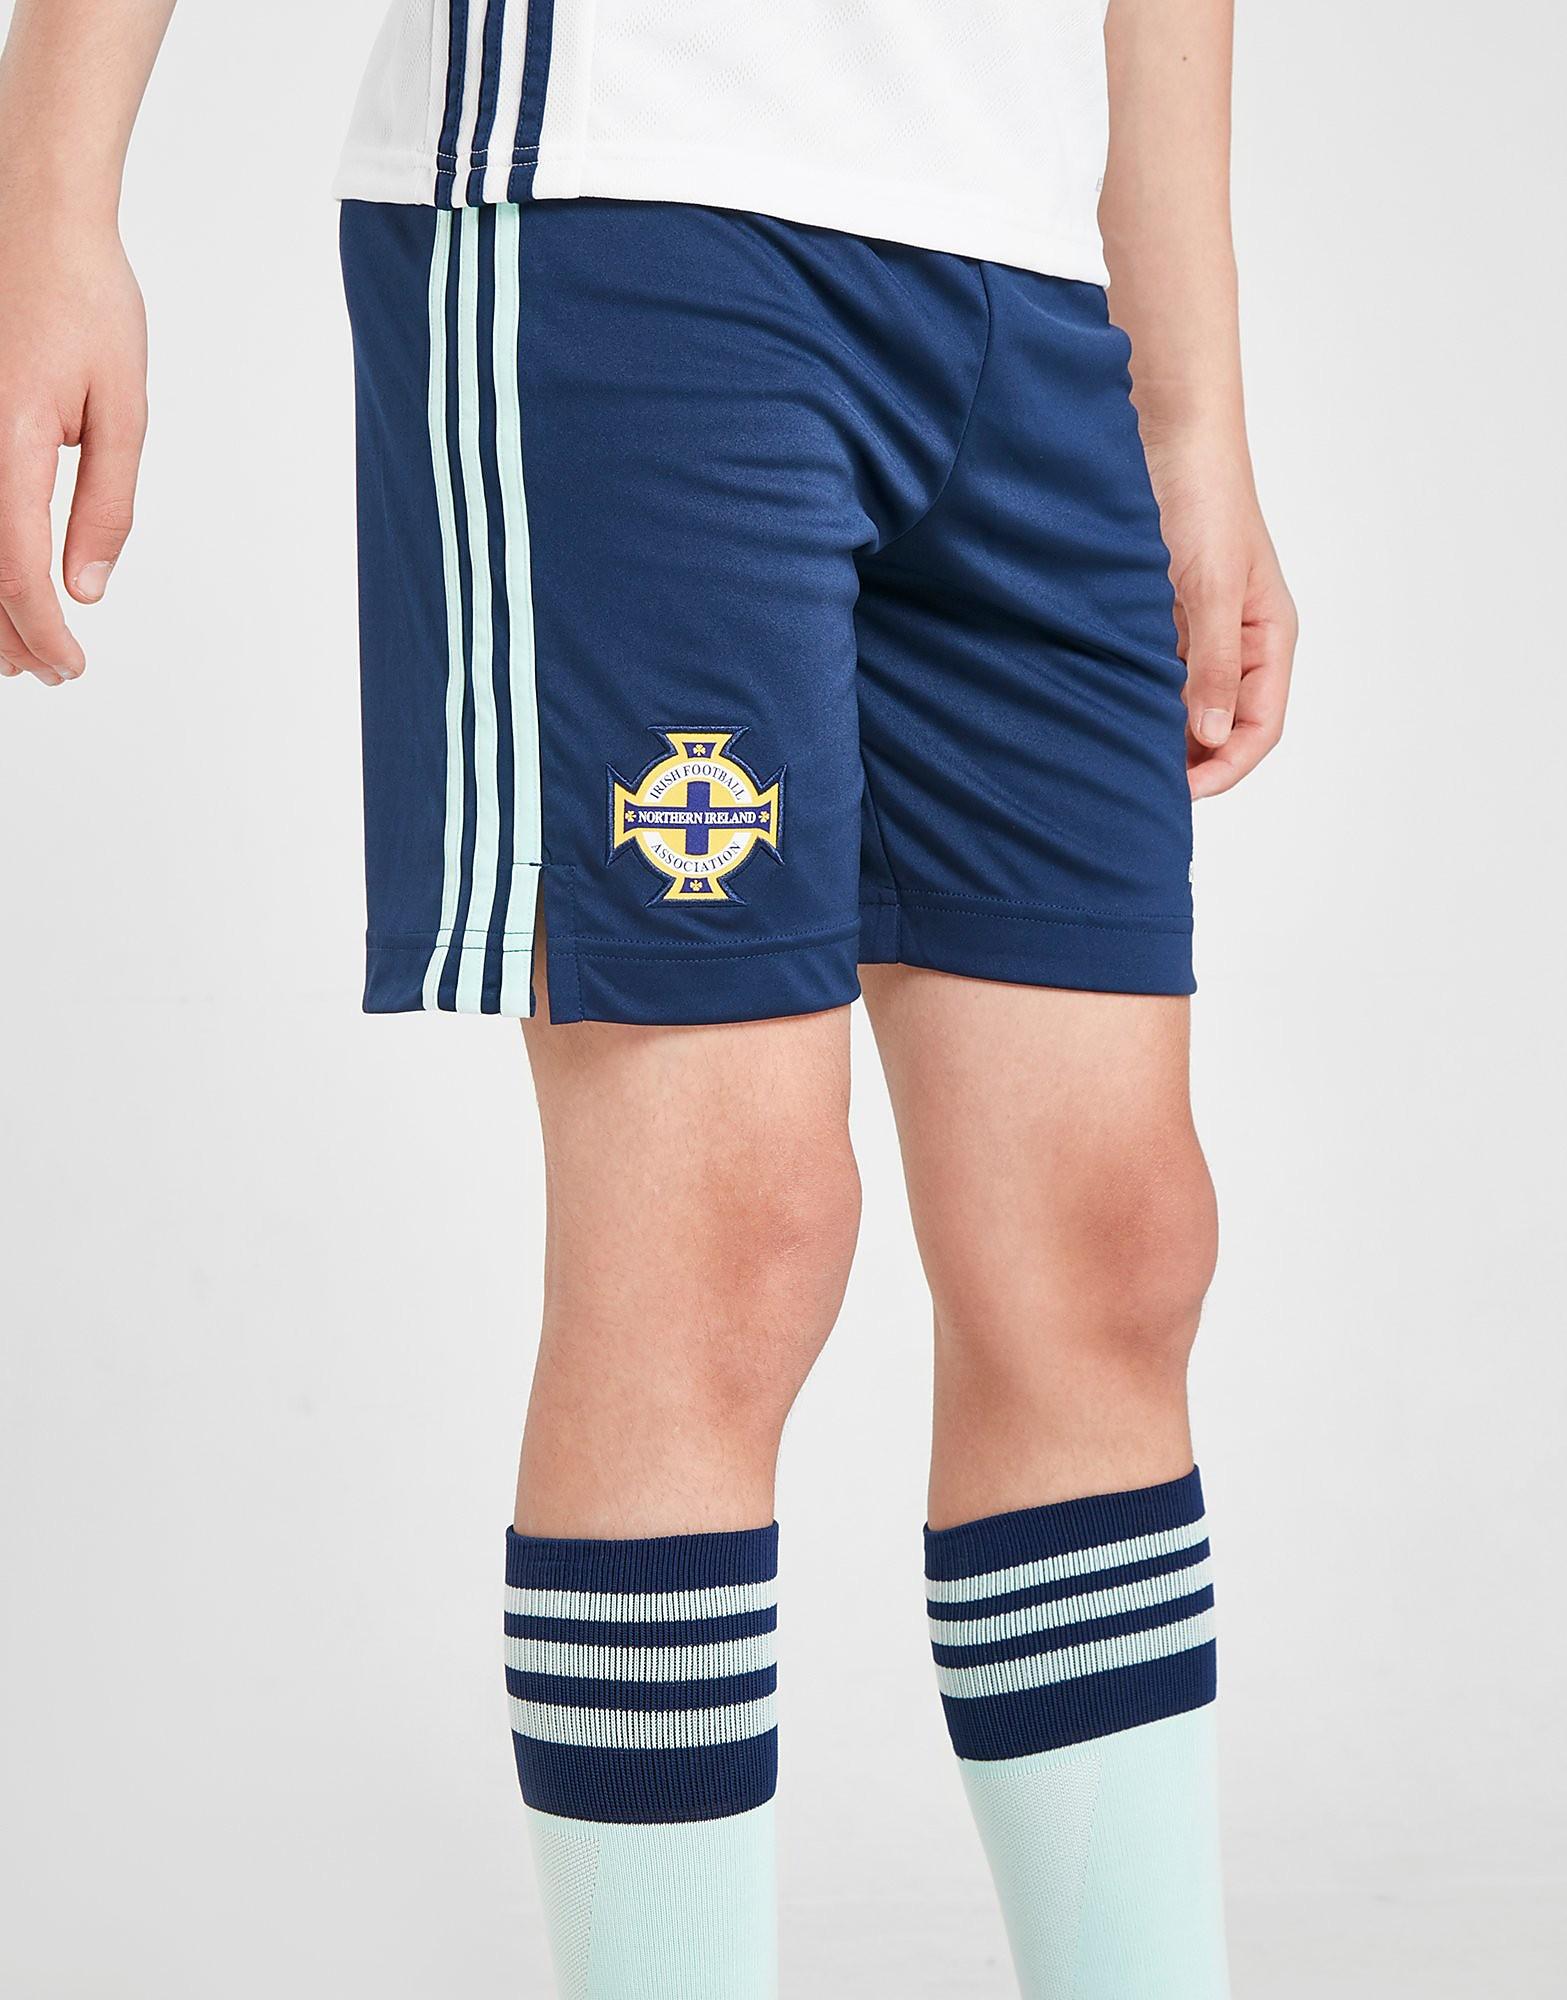 adidas Northern Ireland 2020 Away Shorts Junior PRE ORDER Blauw Kind Blauw